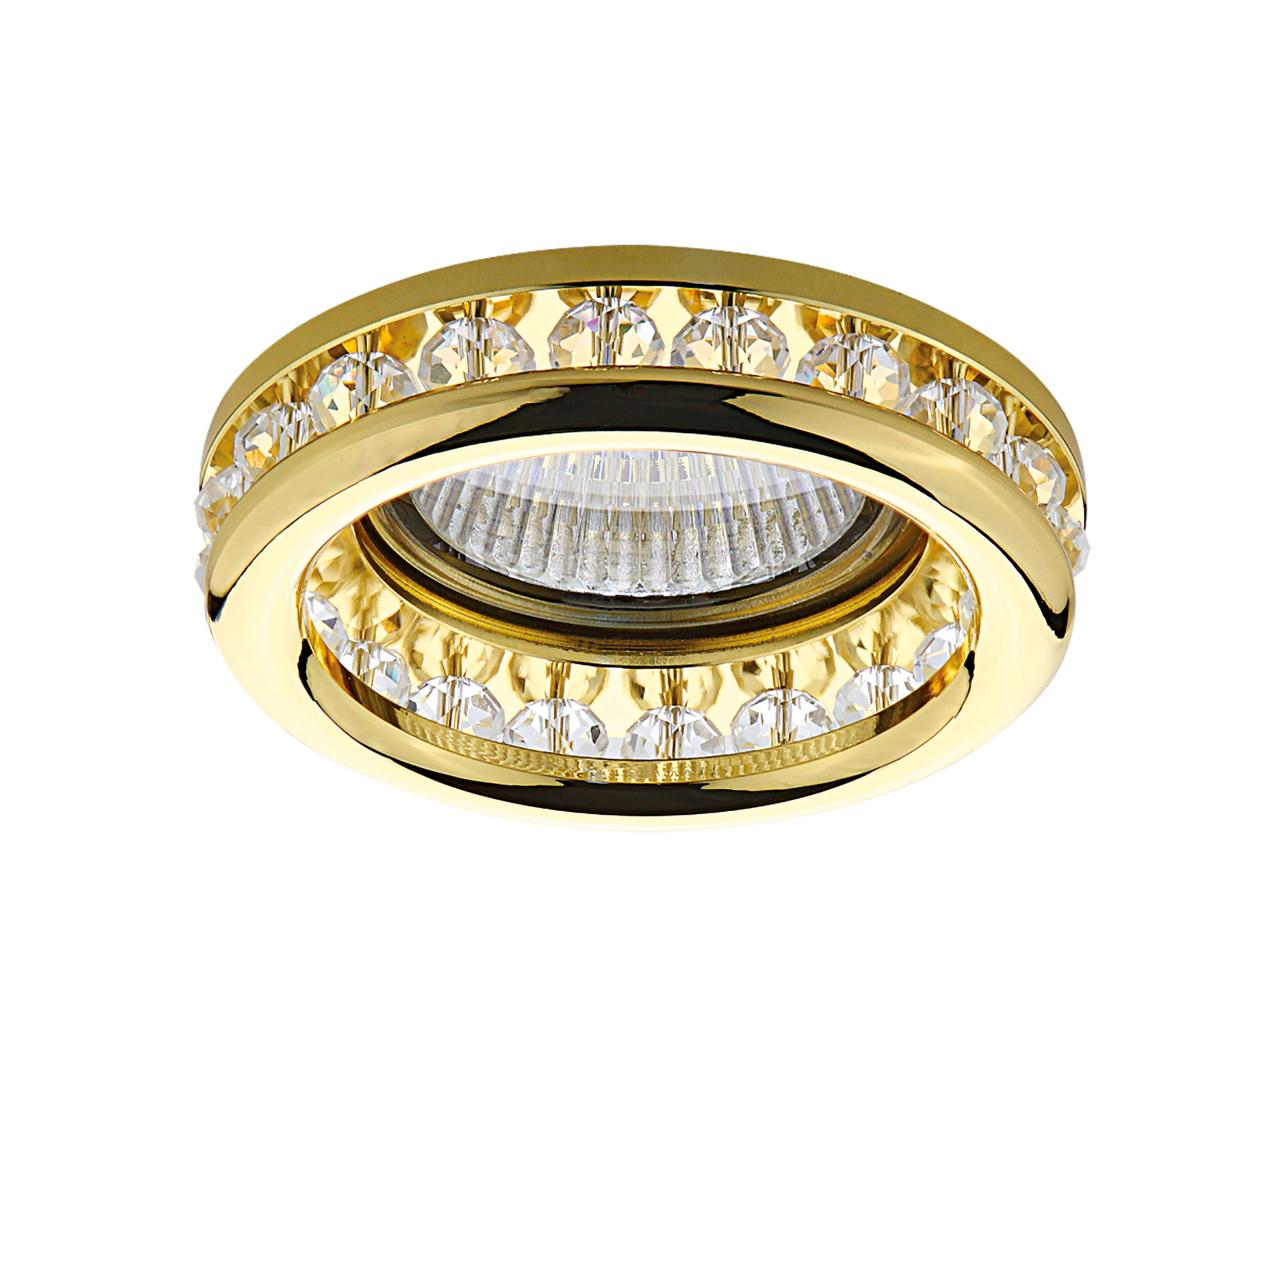 Светильник Monilo INC MR16 / HP16 золото / прозрачный Lightstar 031702